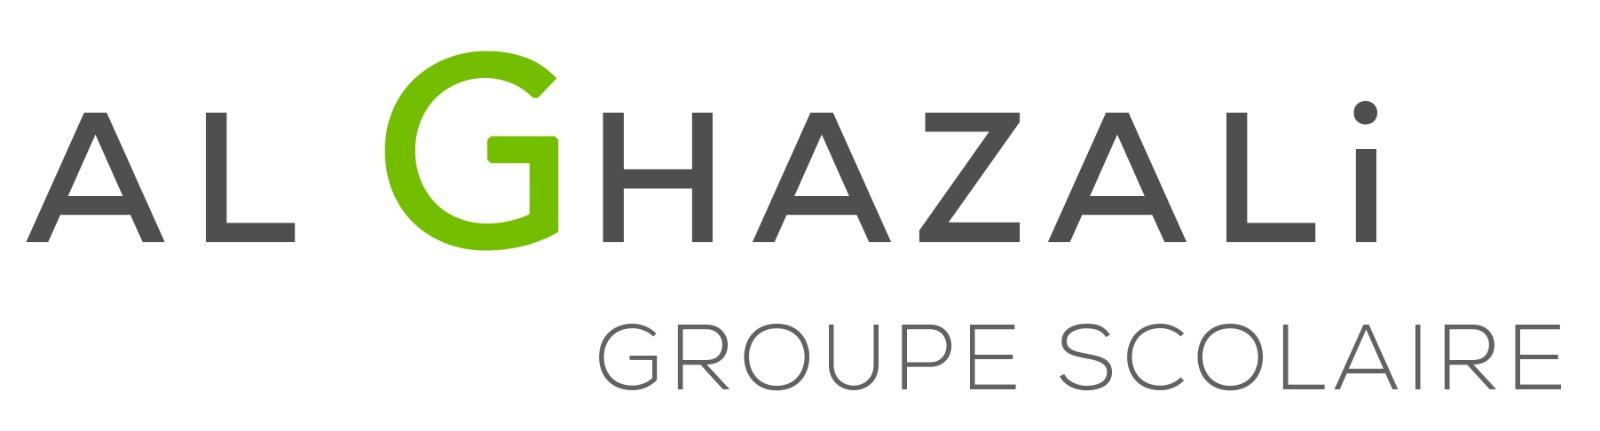 Groupe Scolaire Al Ghazali